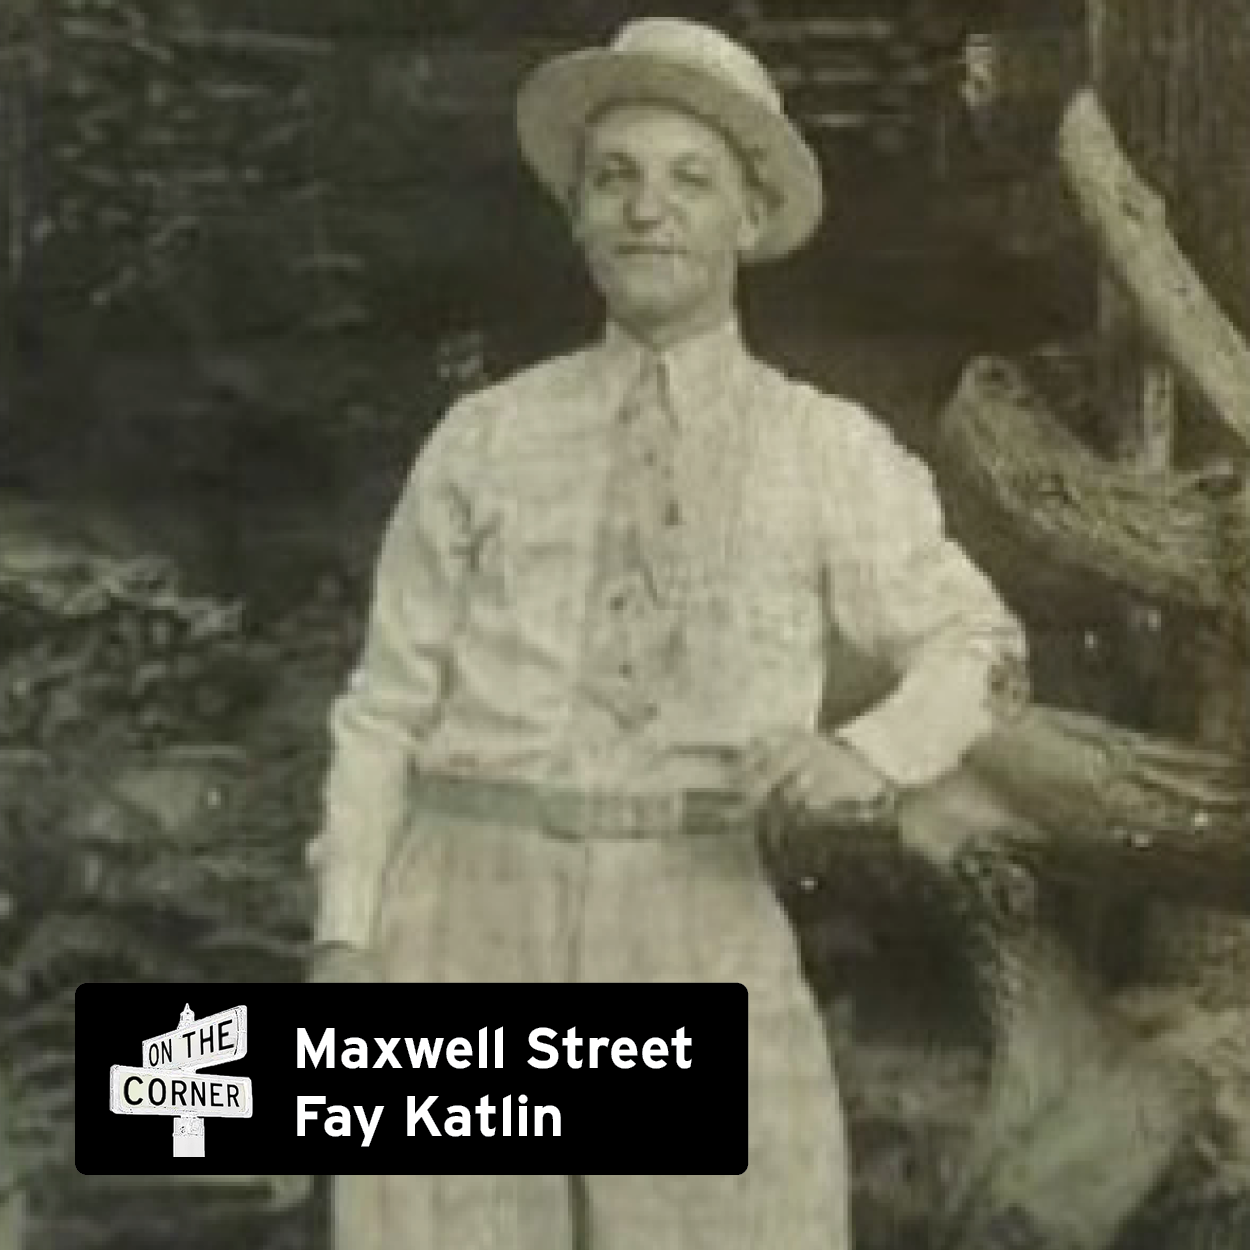 Maxwell Street Fay Katlin (Square)